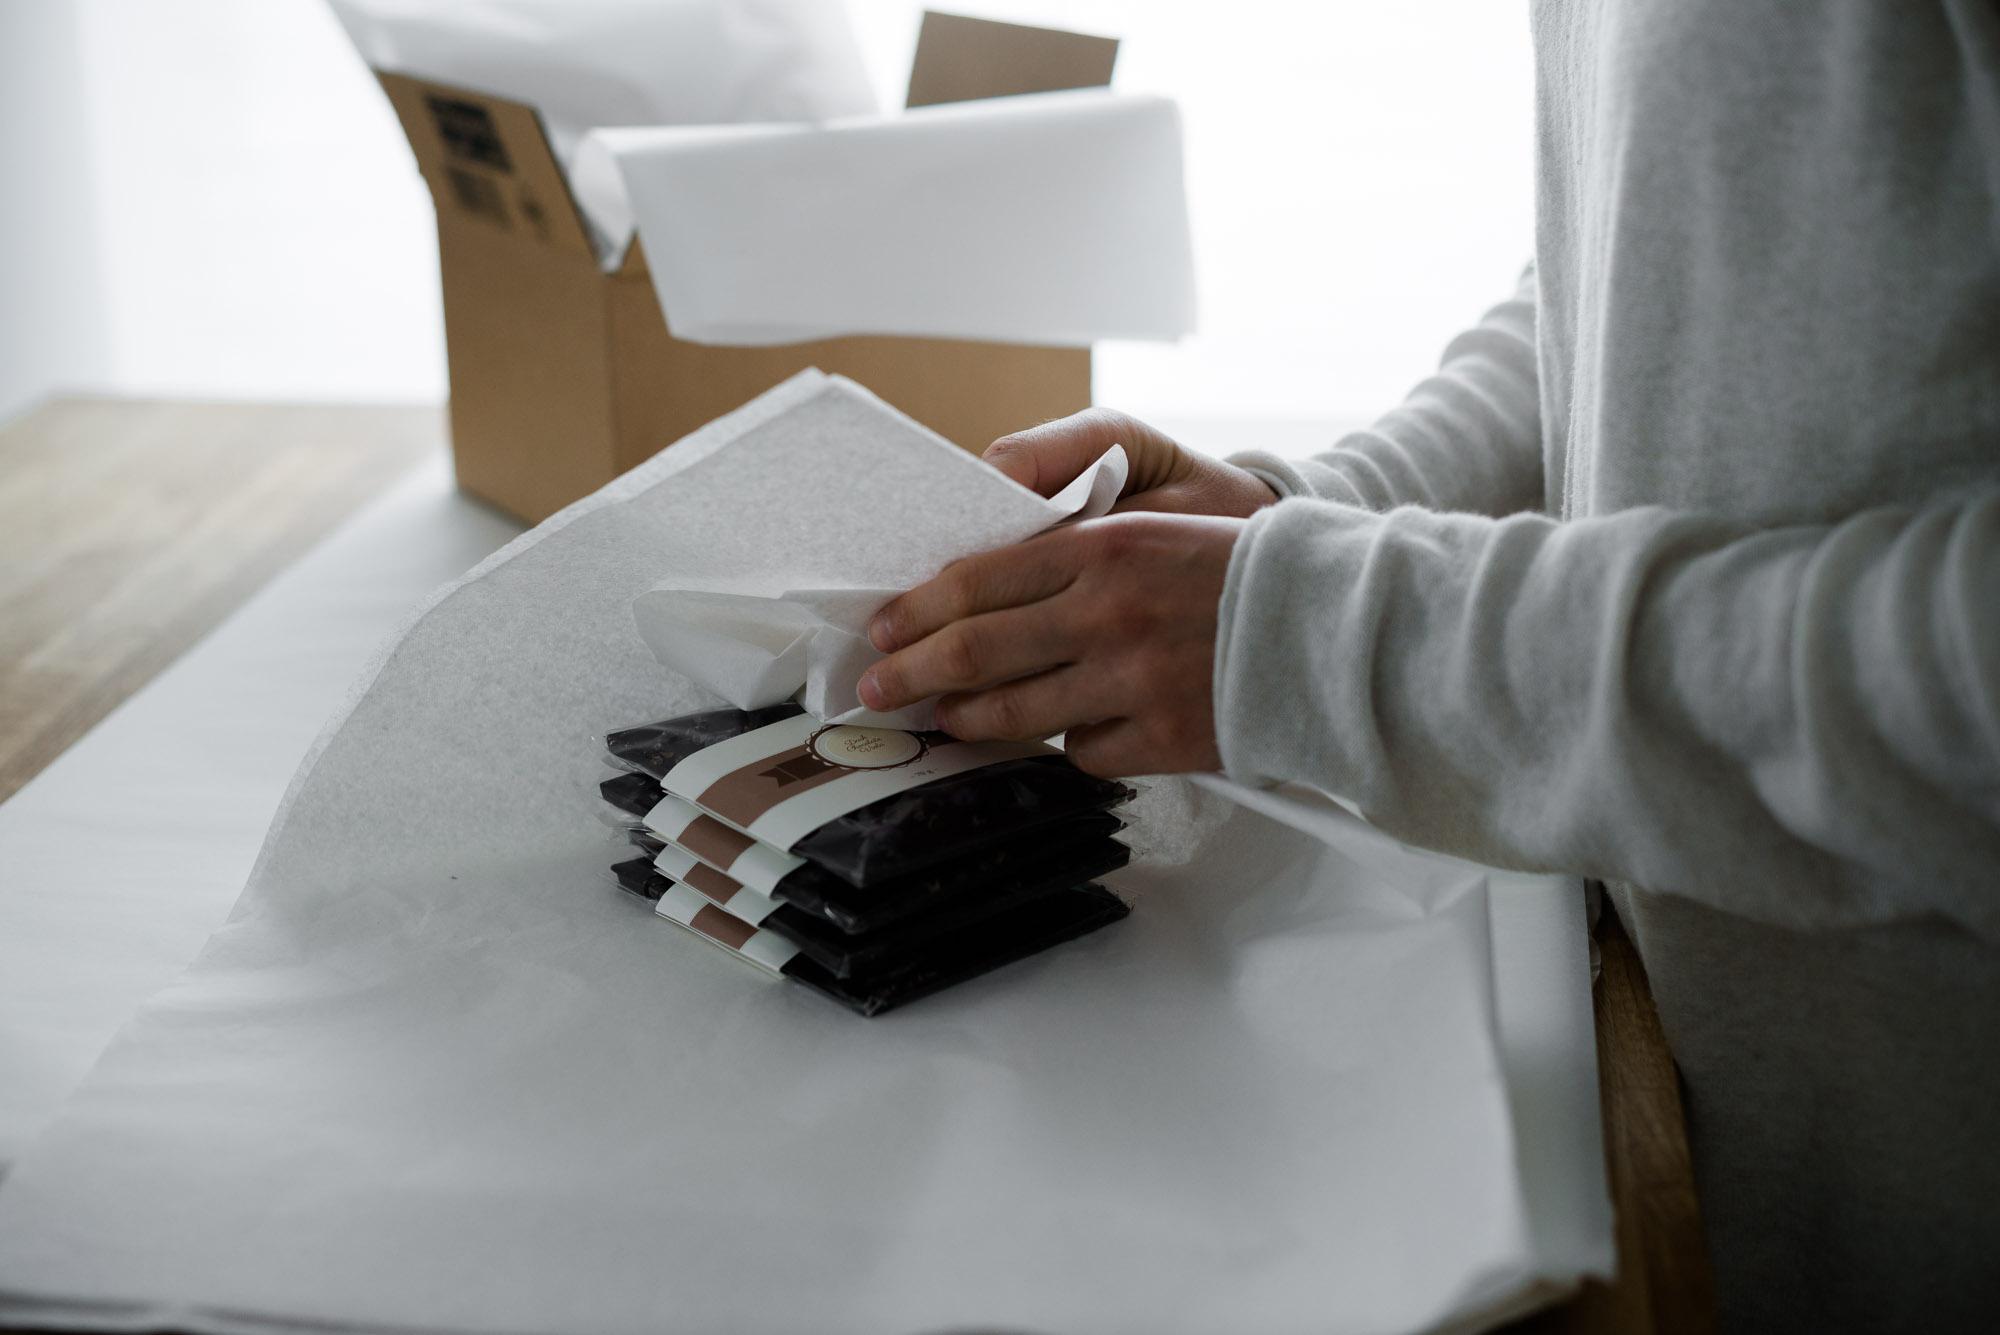 Tafelschokolade verpacken Seidenpapier Versandpolster Kraftpapier Karton